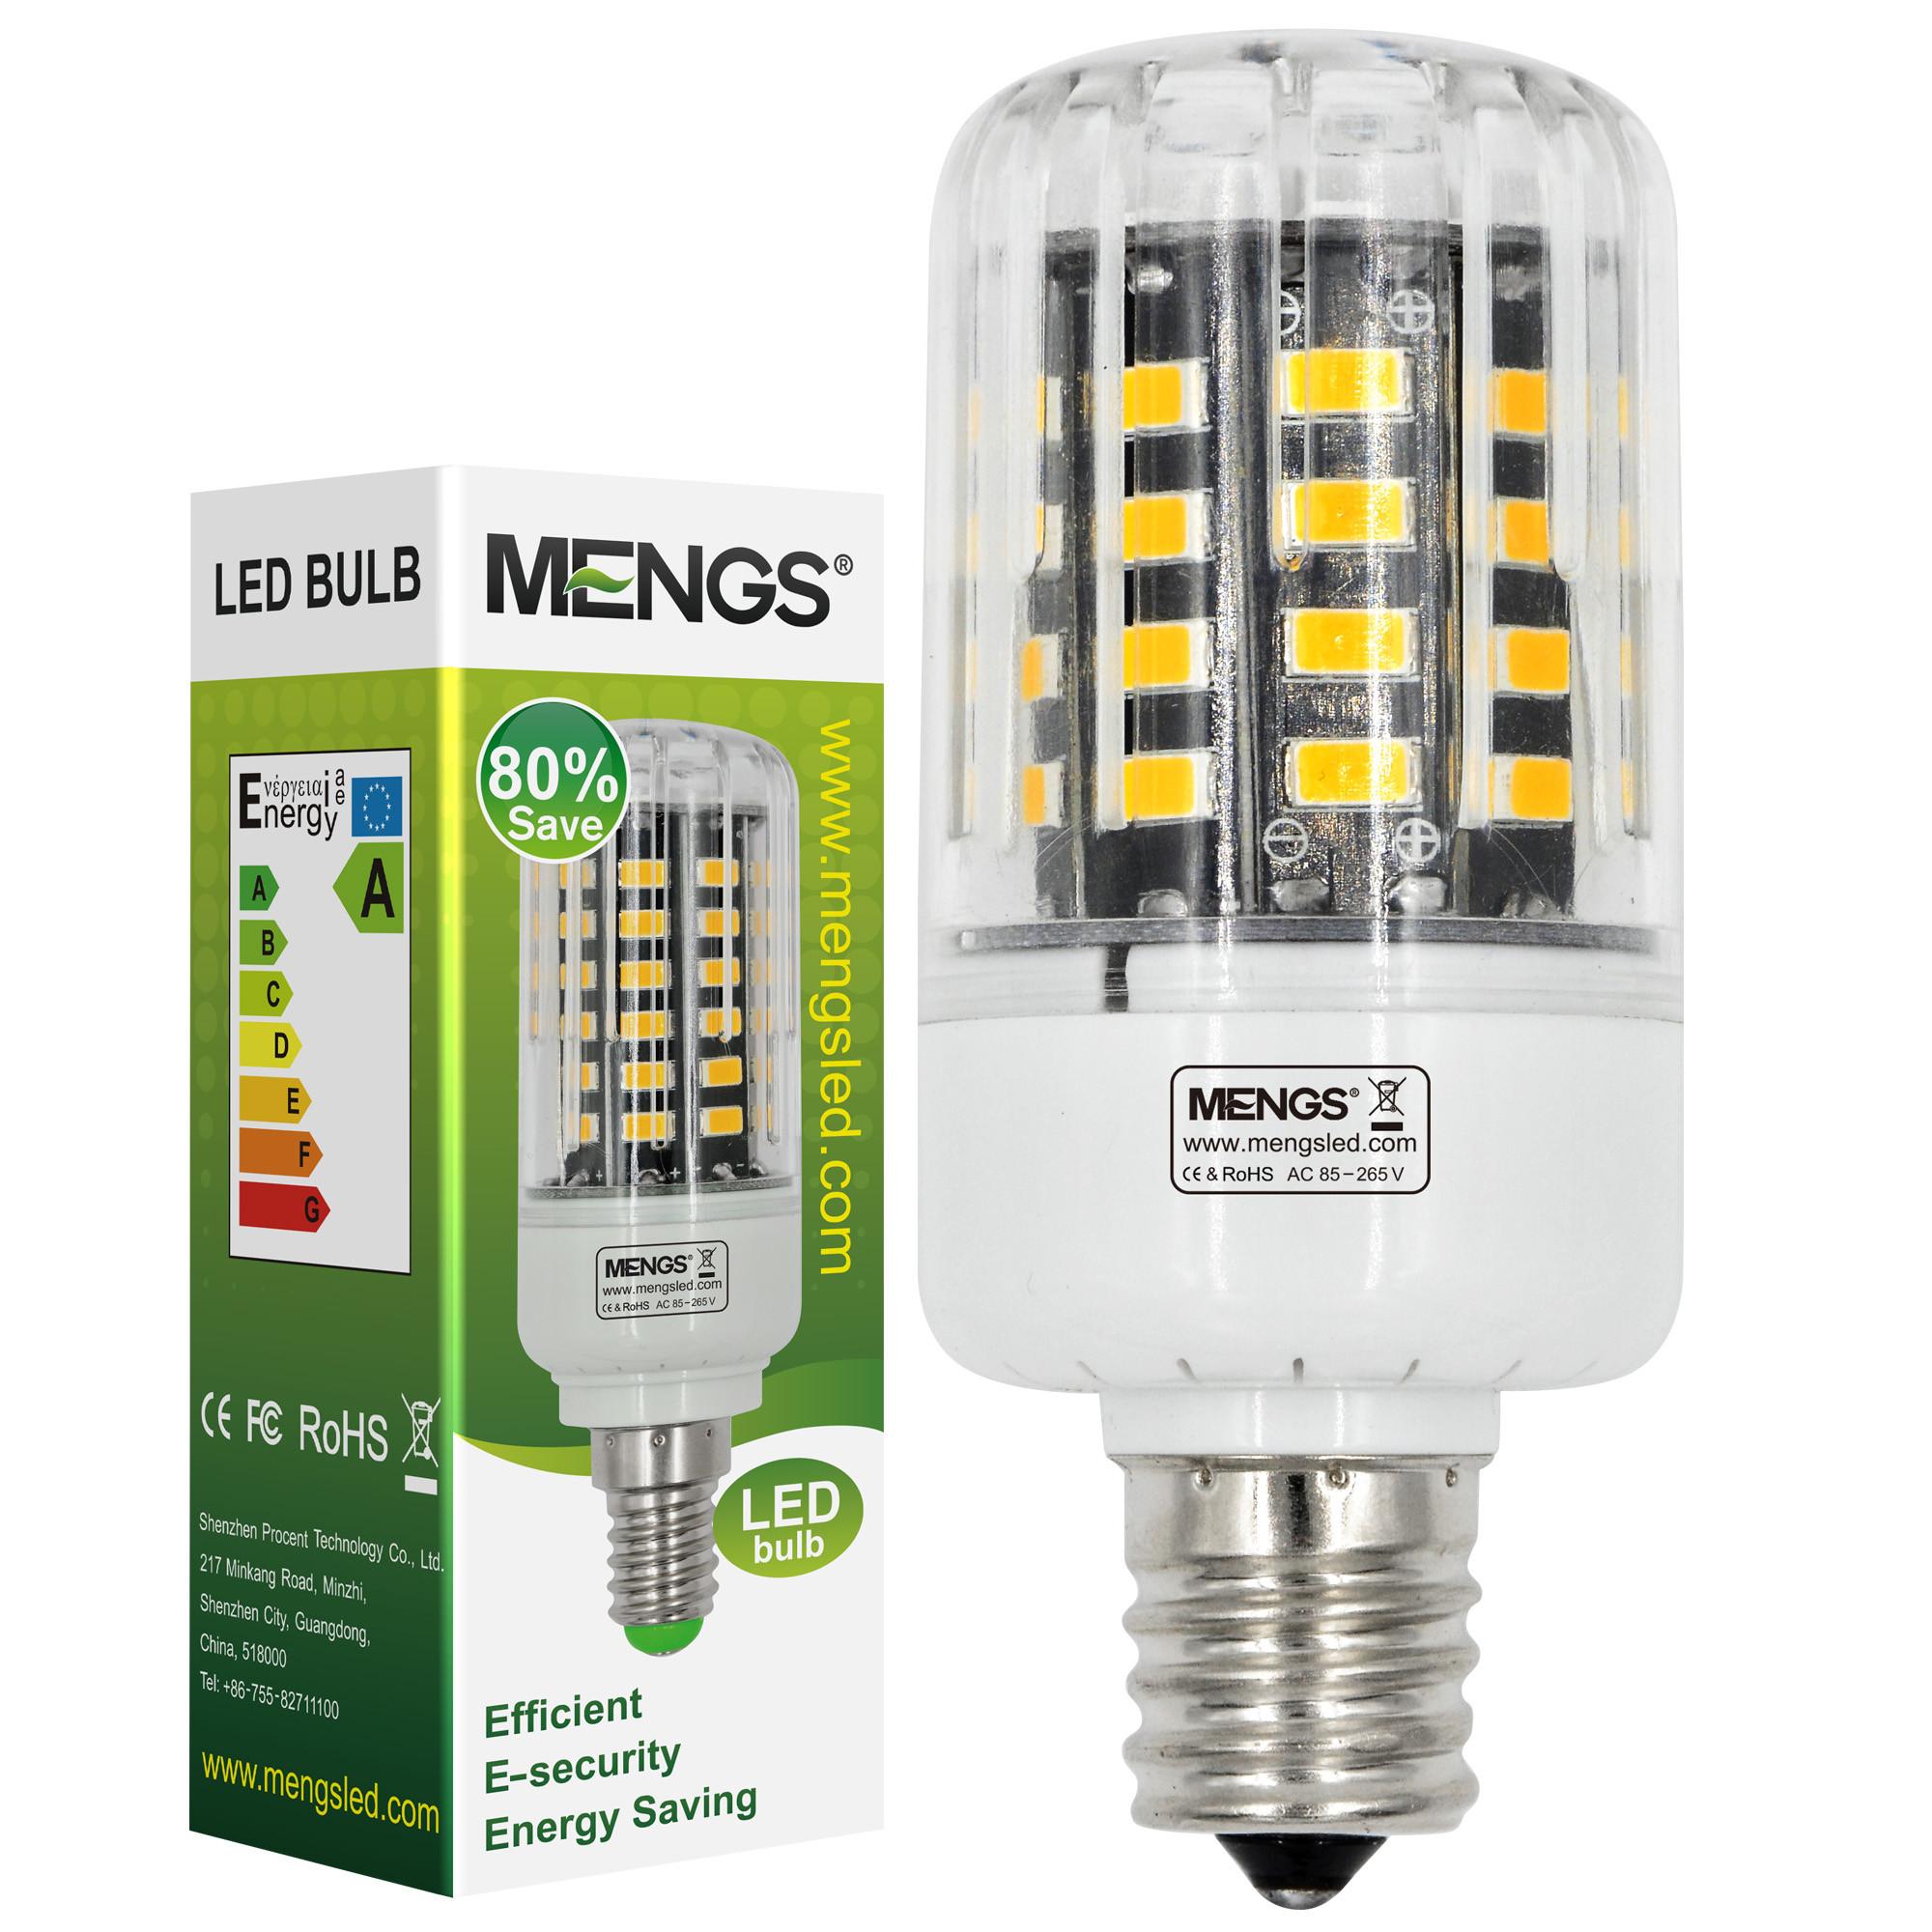 MENGS® Anti-Strobe E17 5W LED Corn Light 40x 5736 SMD LED Bulb Lamp In Cool White Energy-Saving Lamp